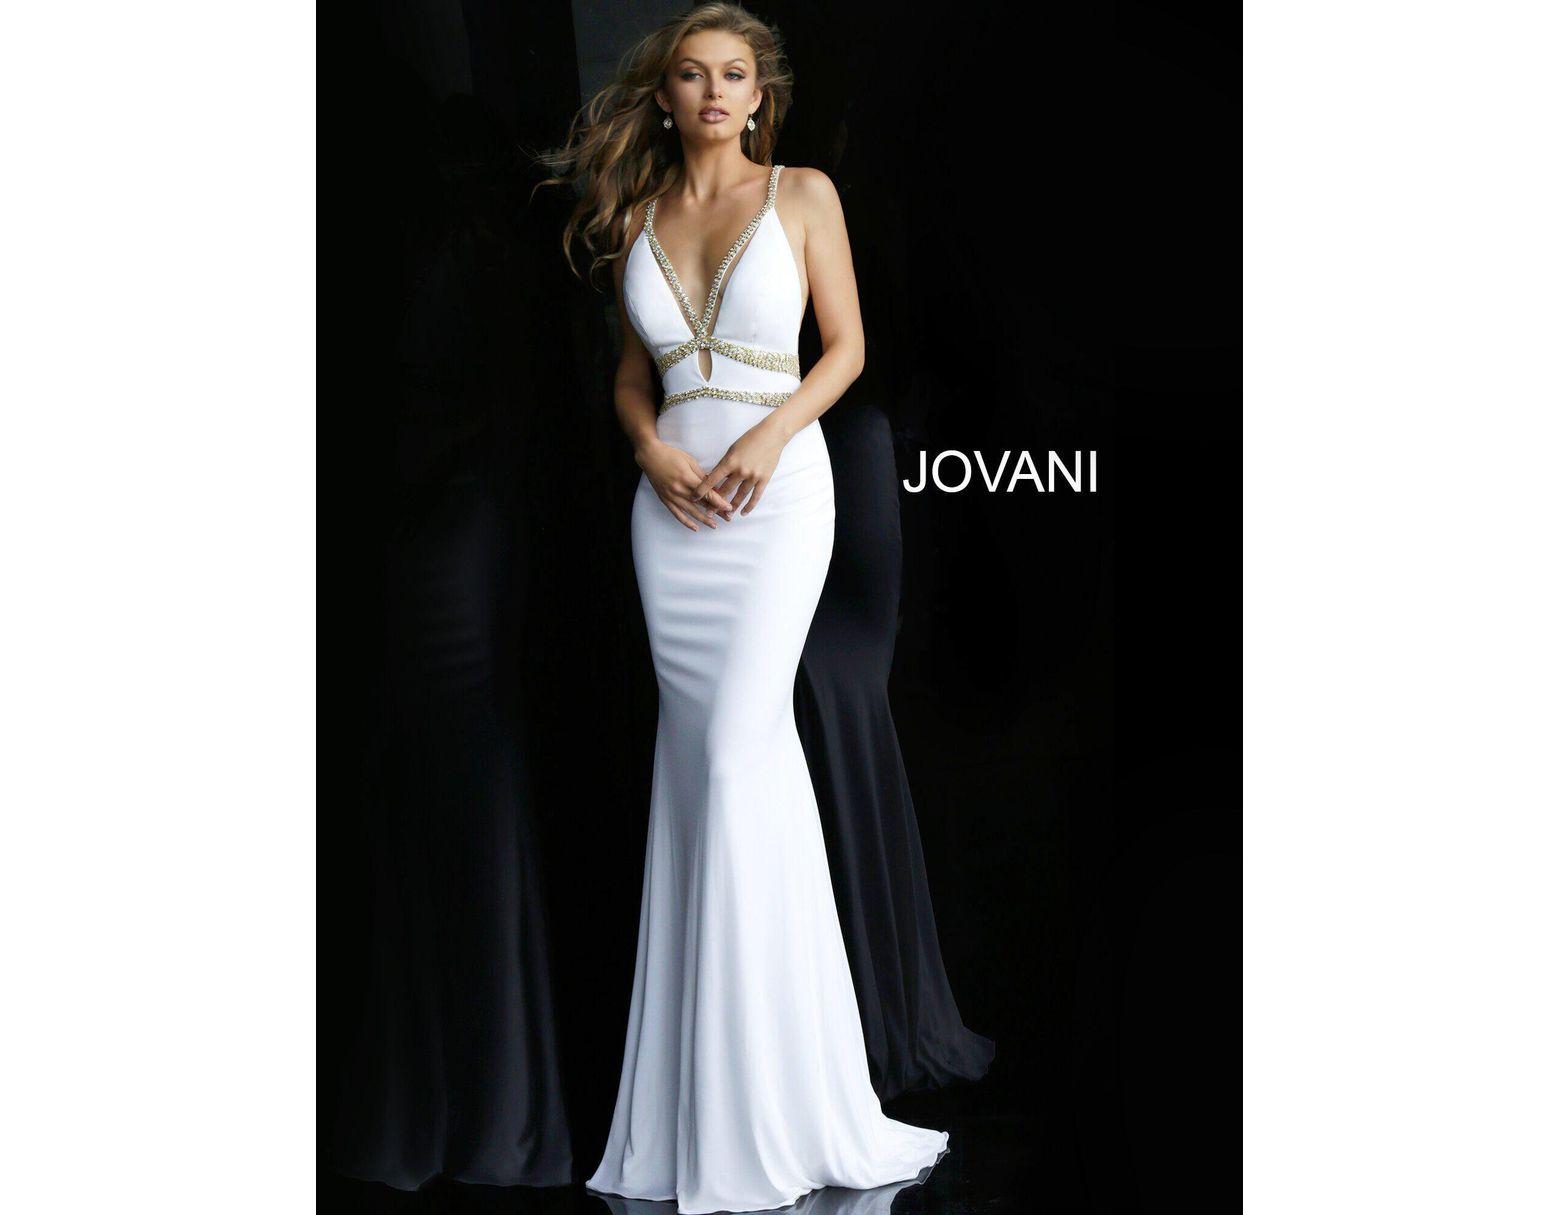 b0940fb1597 Jovani 60232 Gilt-crisscross Detailed Plunging Mermaid Gown in Black - Lyst